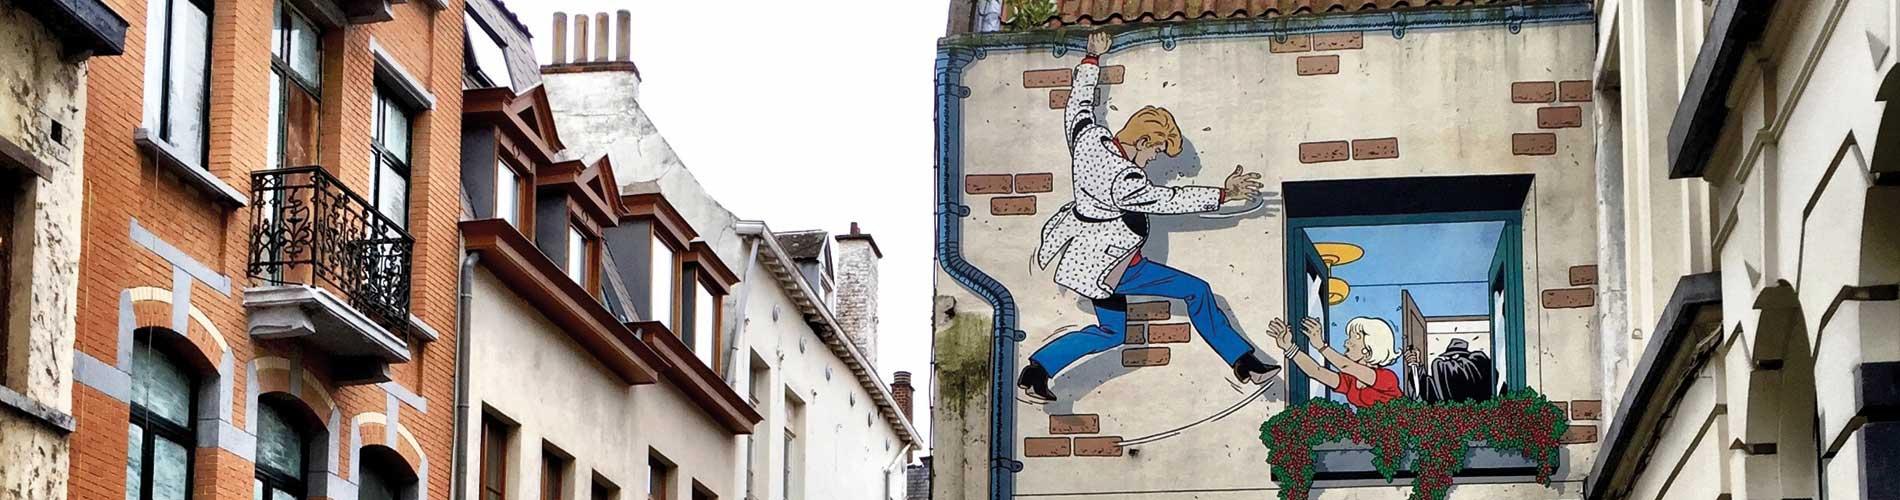 Blog_BelgianBreaks2020_Brussels_Mural_1900x500_Q120